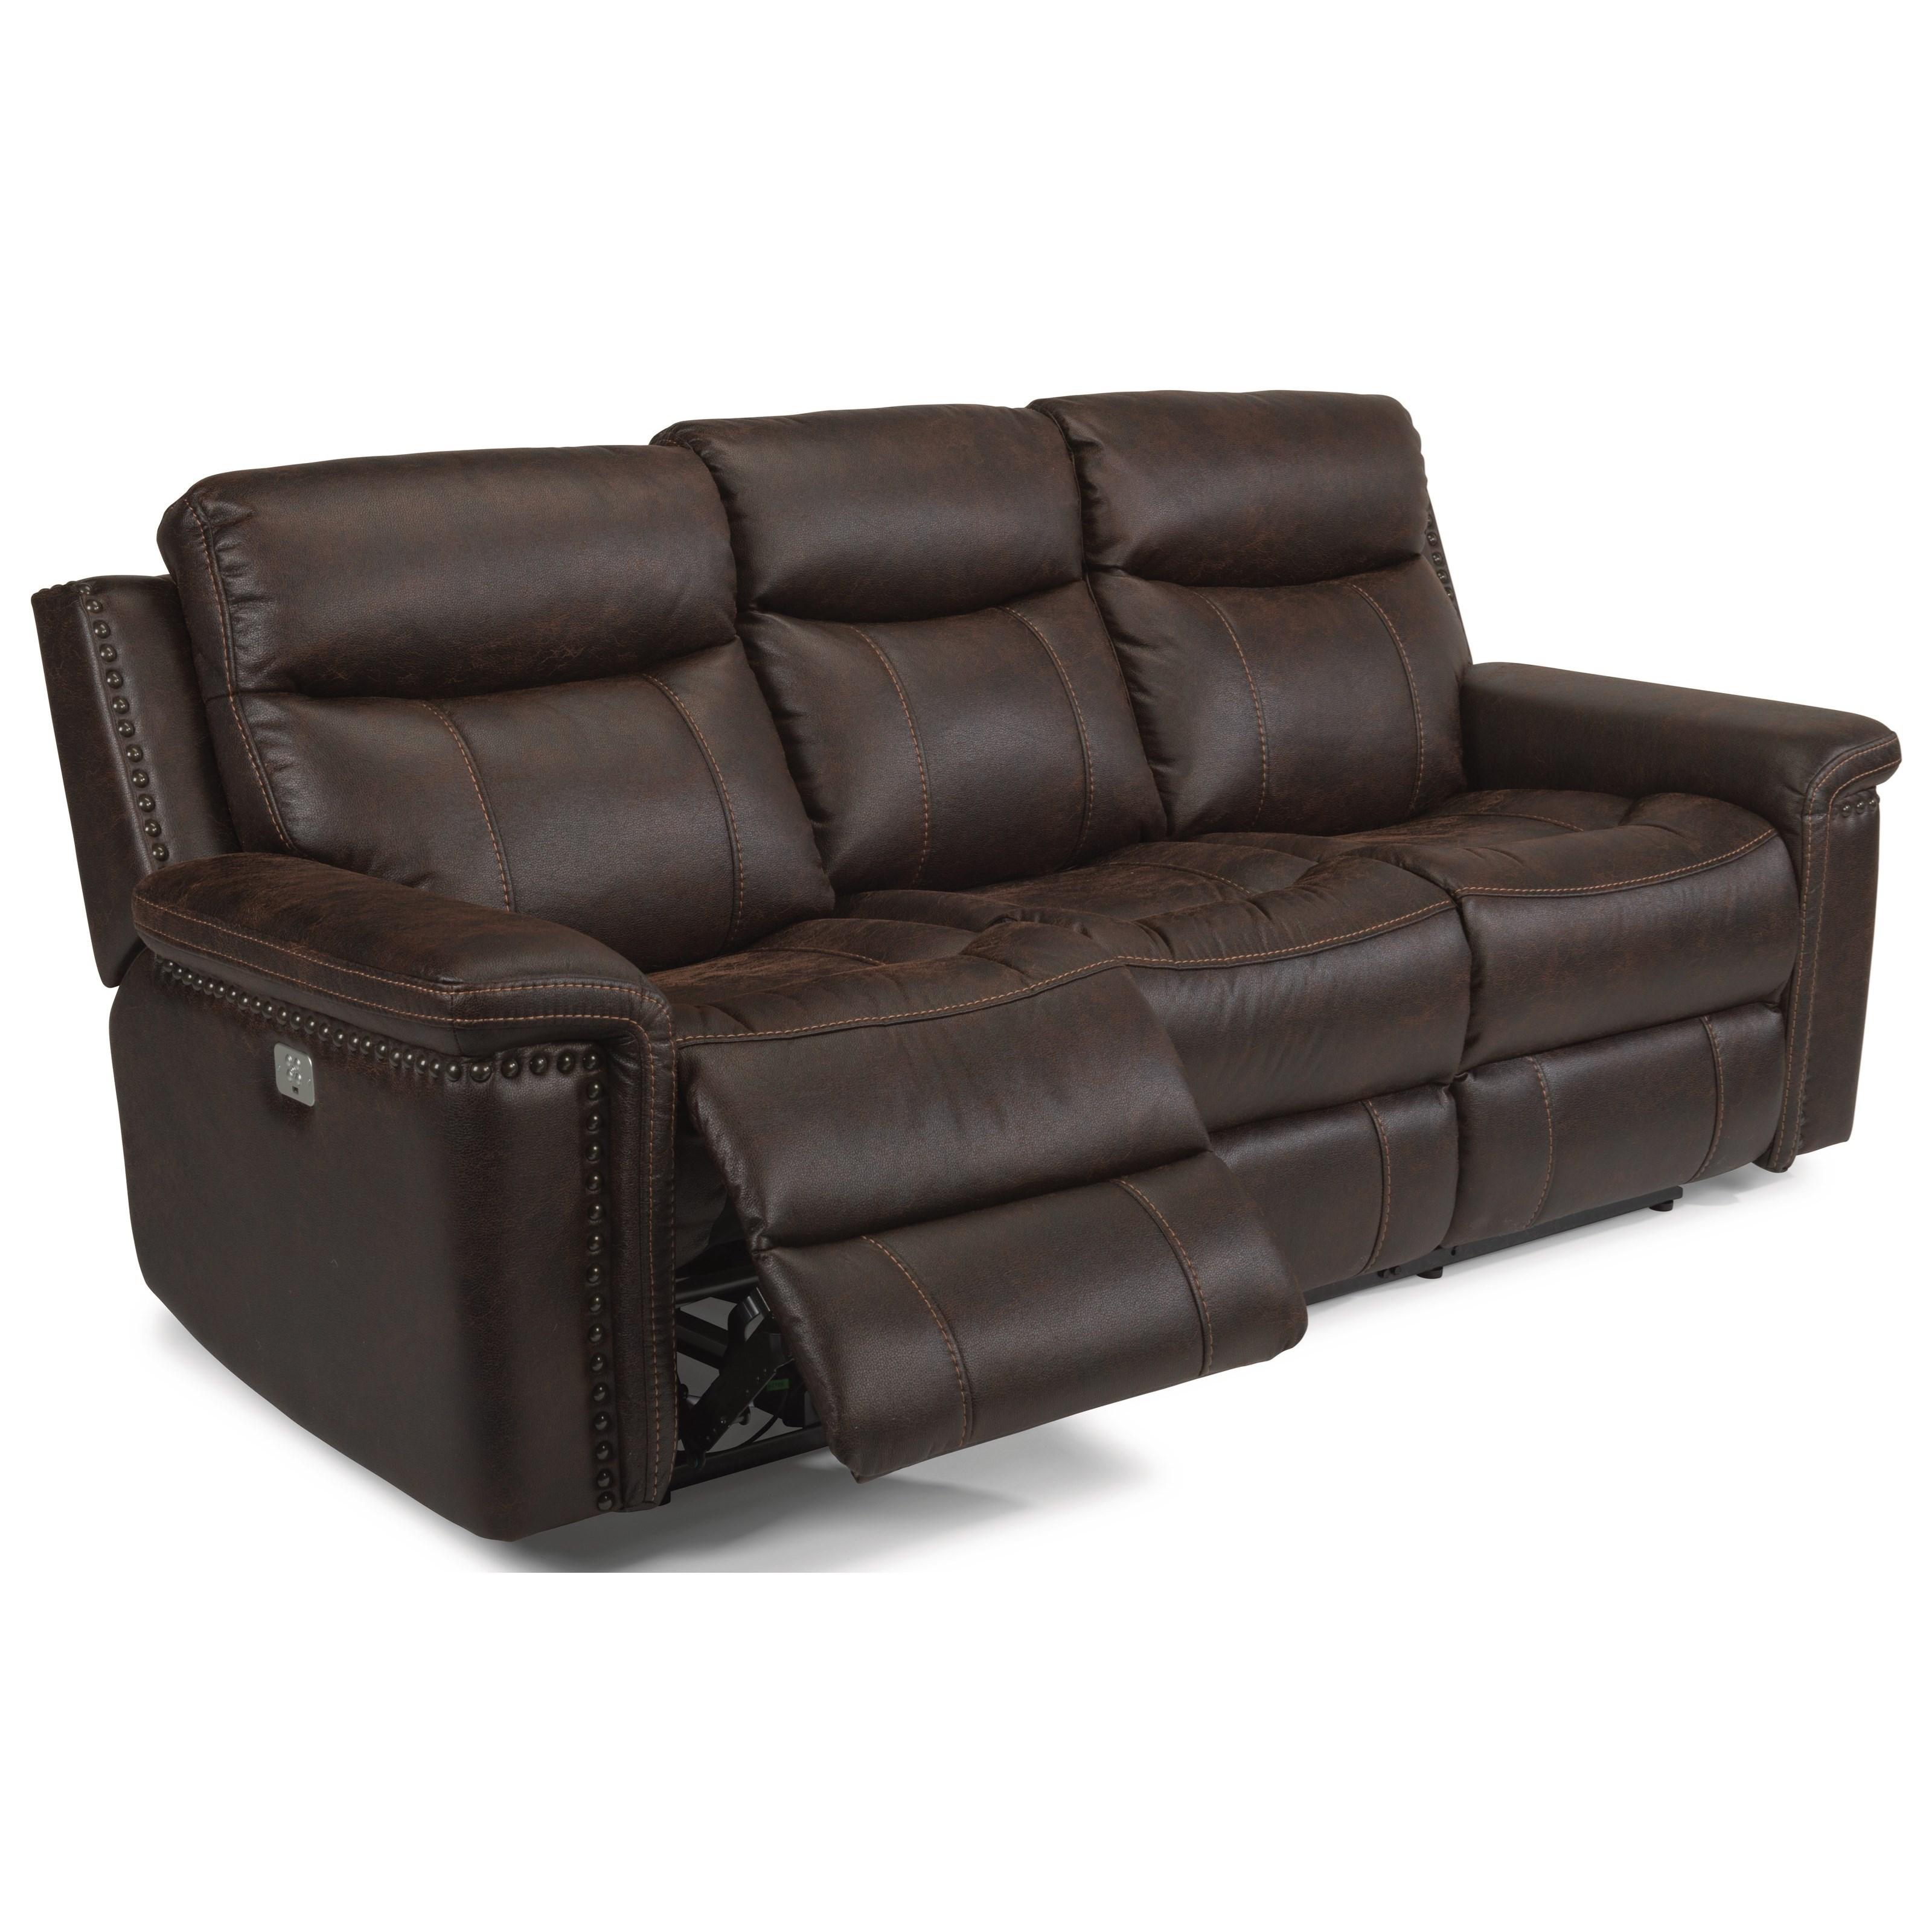 flexsteel reclining sofa warranty replacement seat cushions australia latitudes trevor 1362 62ph rustic power with headrests